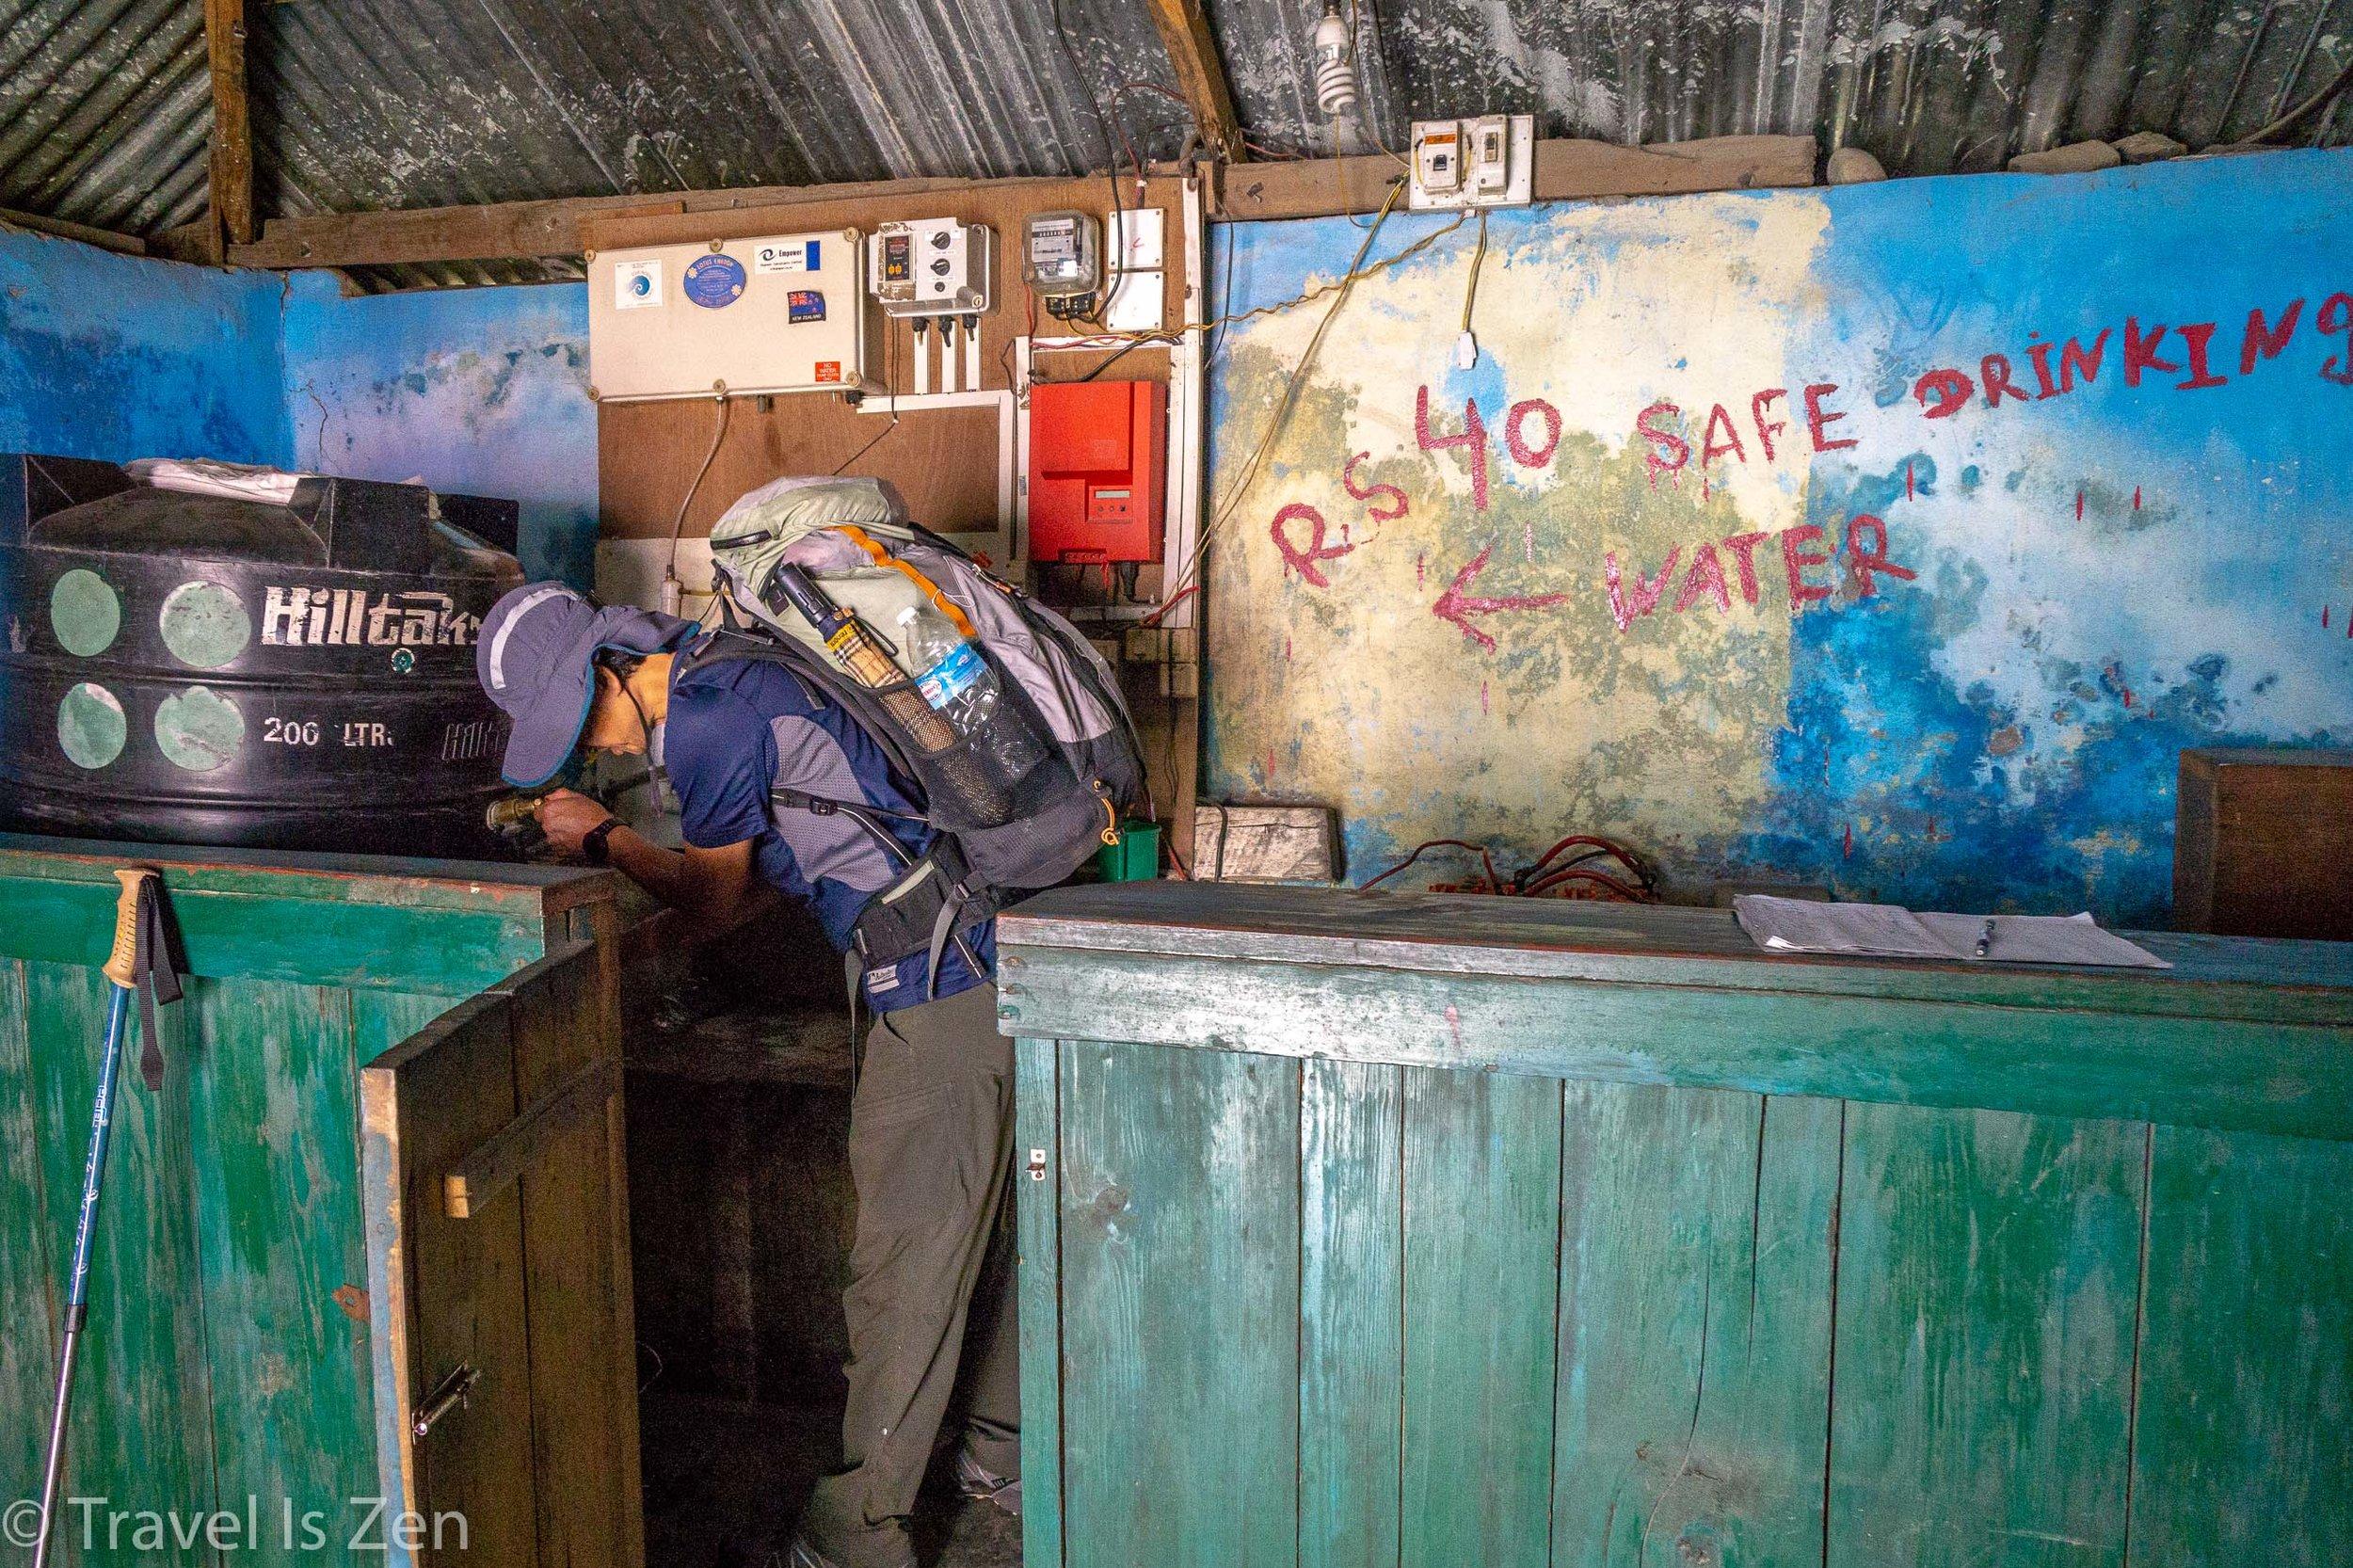 ACAP water station